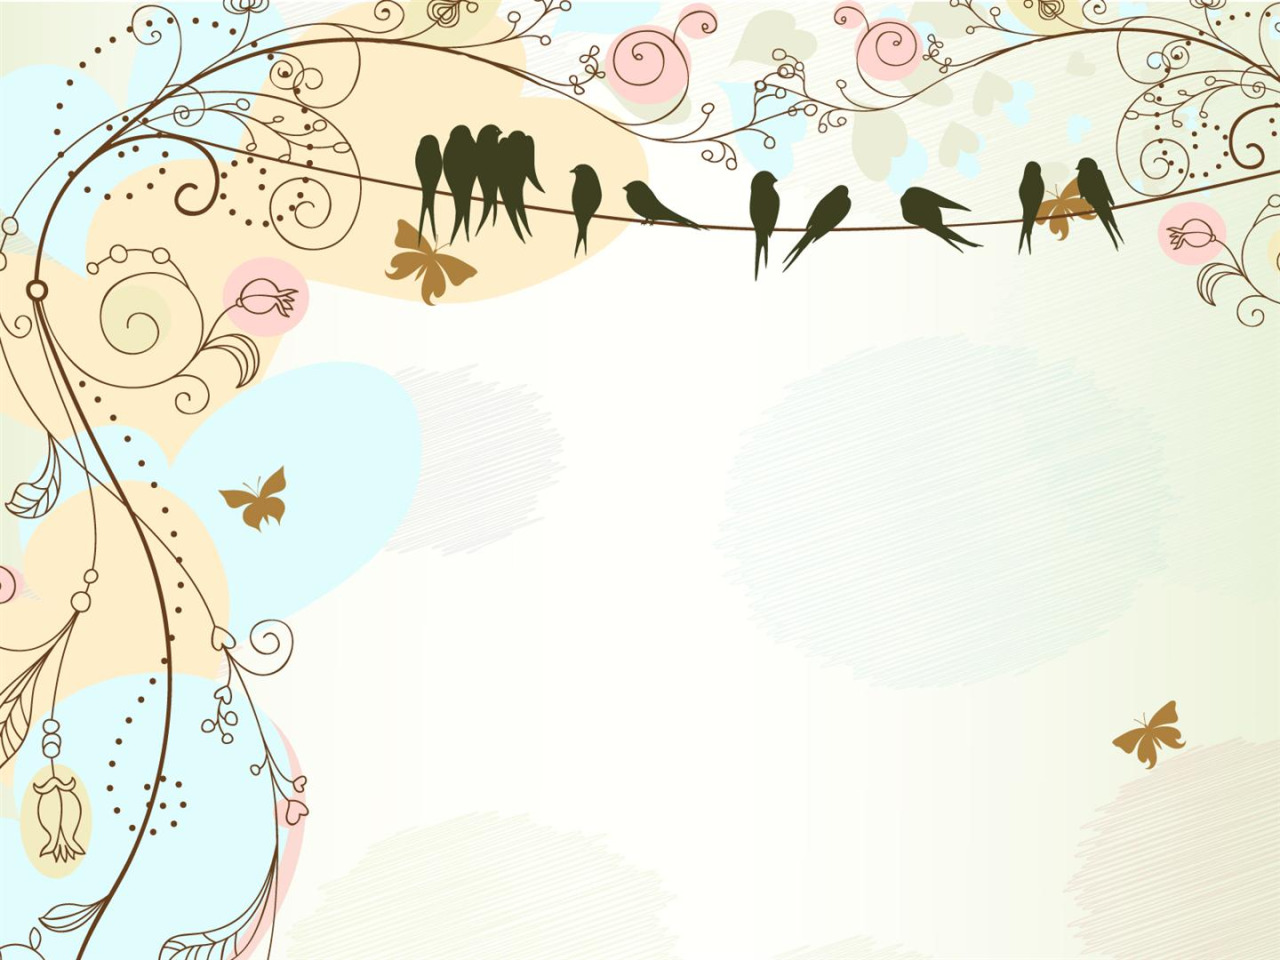 marketing-slides-birds-frame-backgrounds-powerpoint